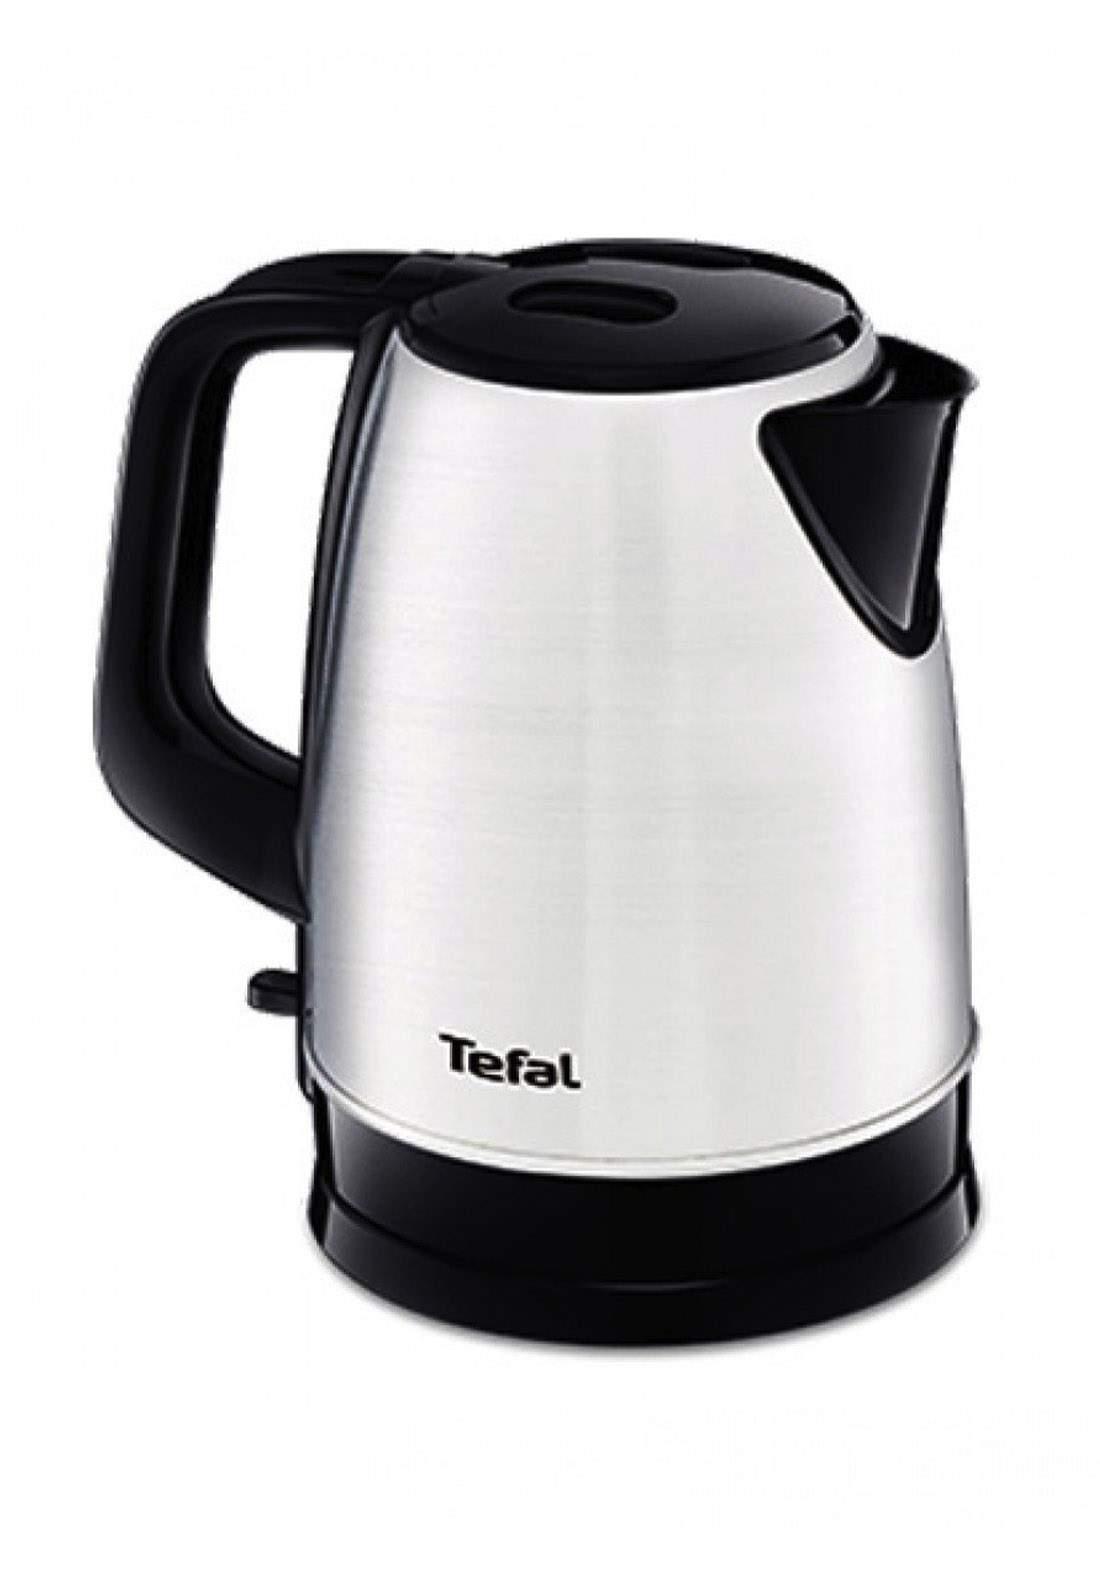 Tefal Dialog Electric Kettle - Stainless Steel غلاية كهربائية